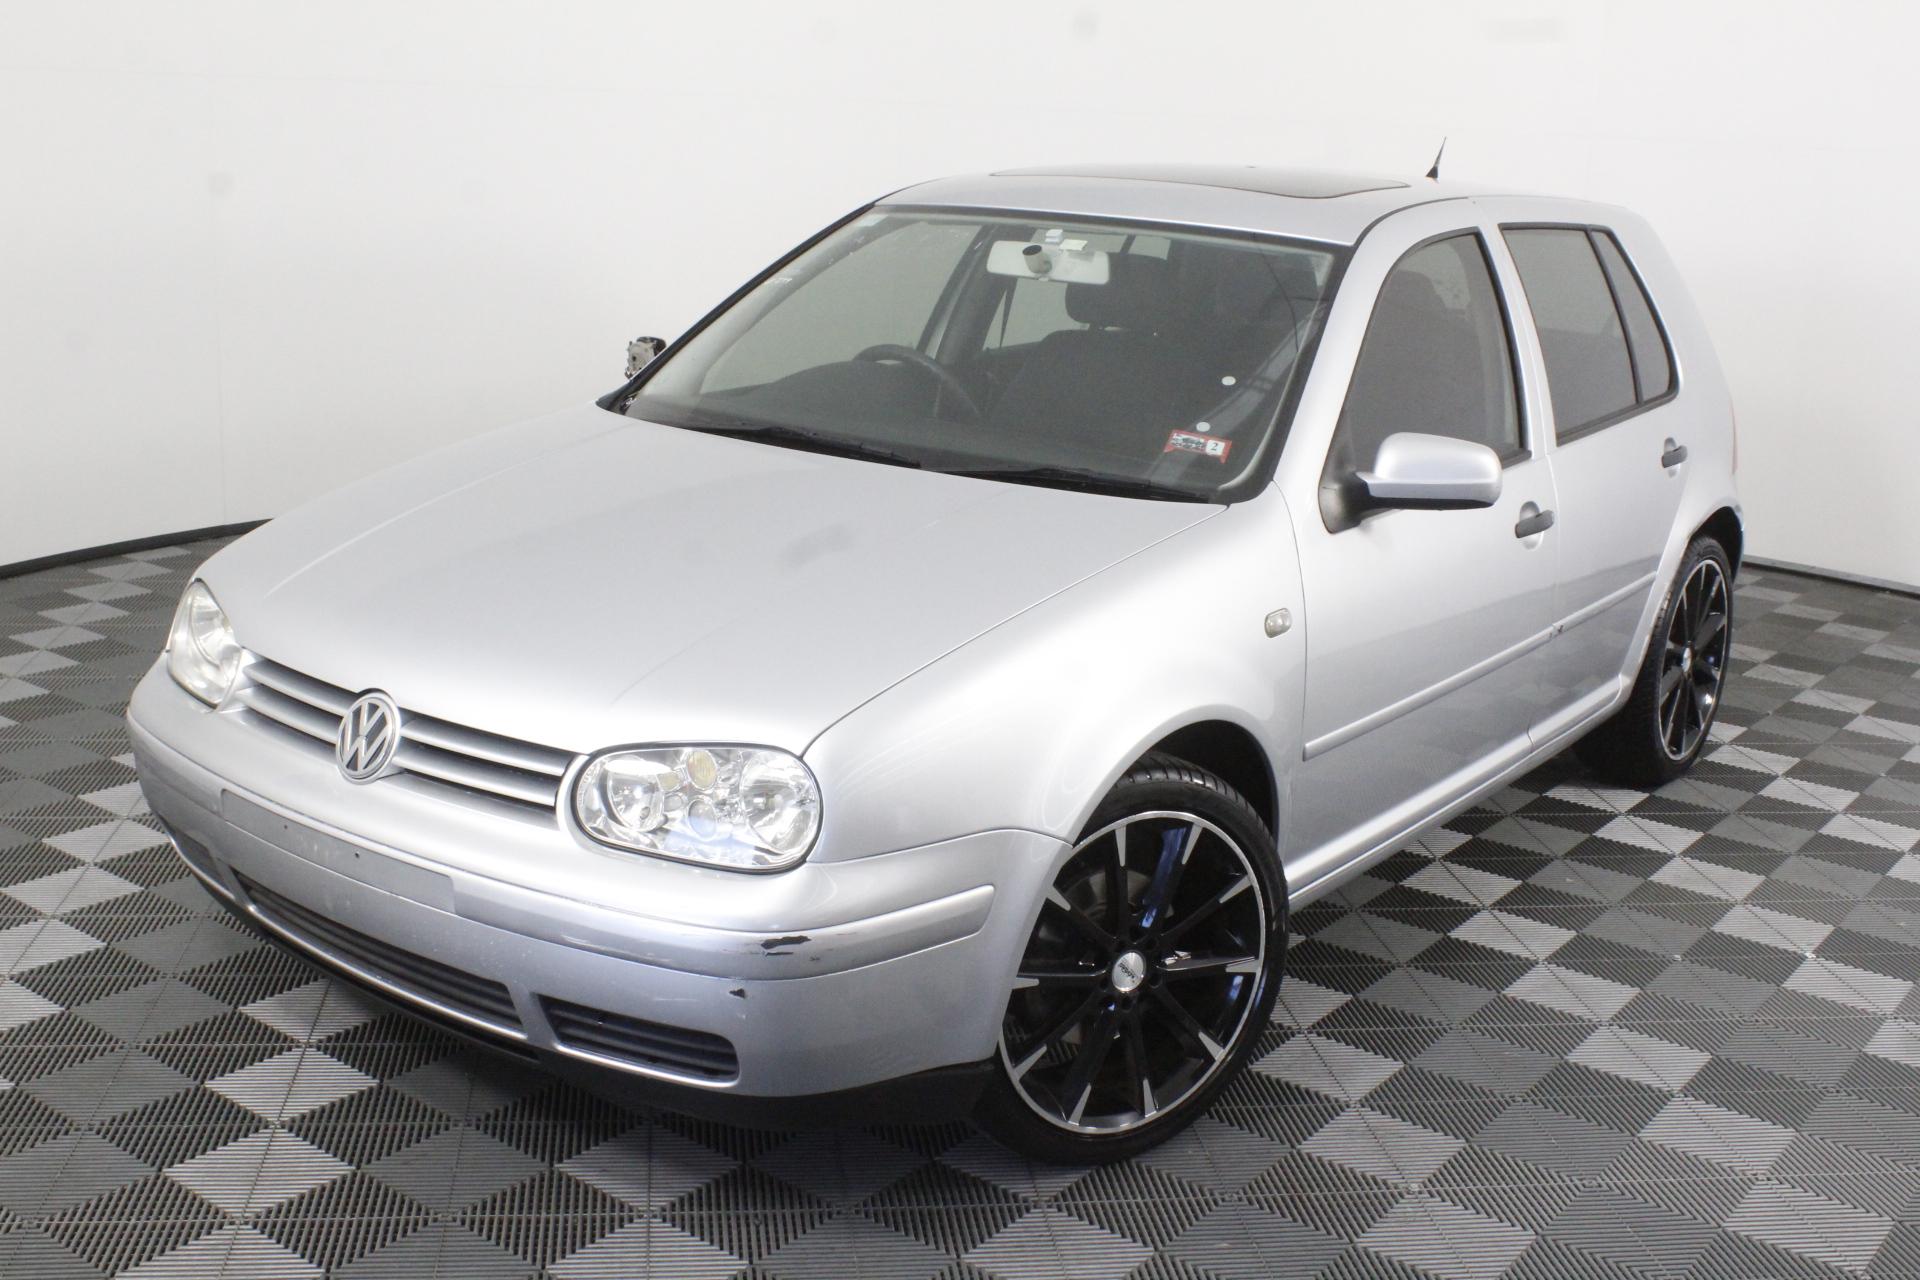 2002 Volkswagen Golf GLE A4 Automatic Hatchback